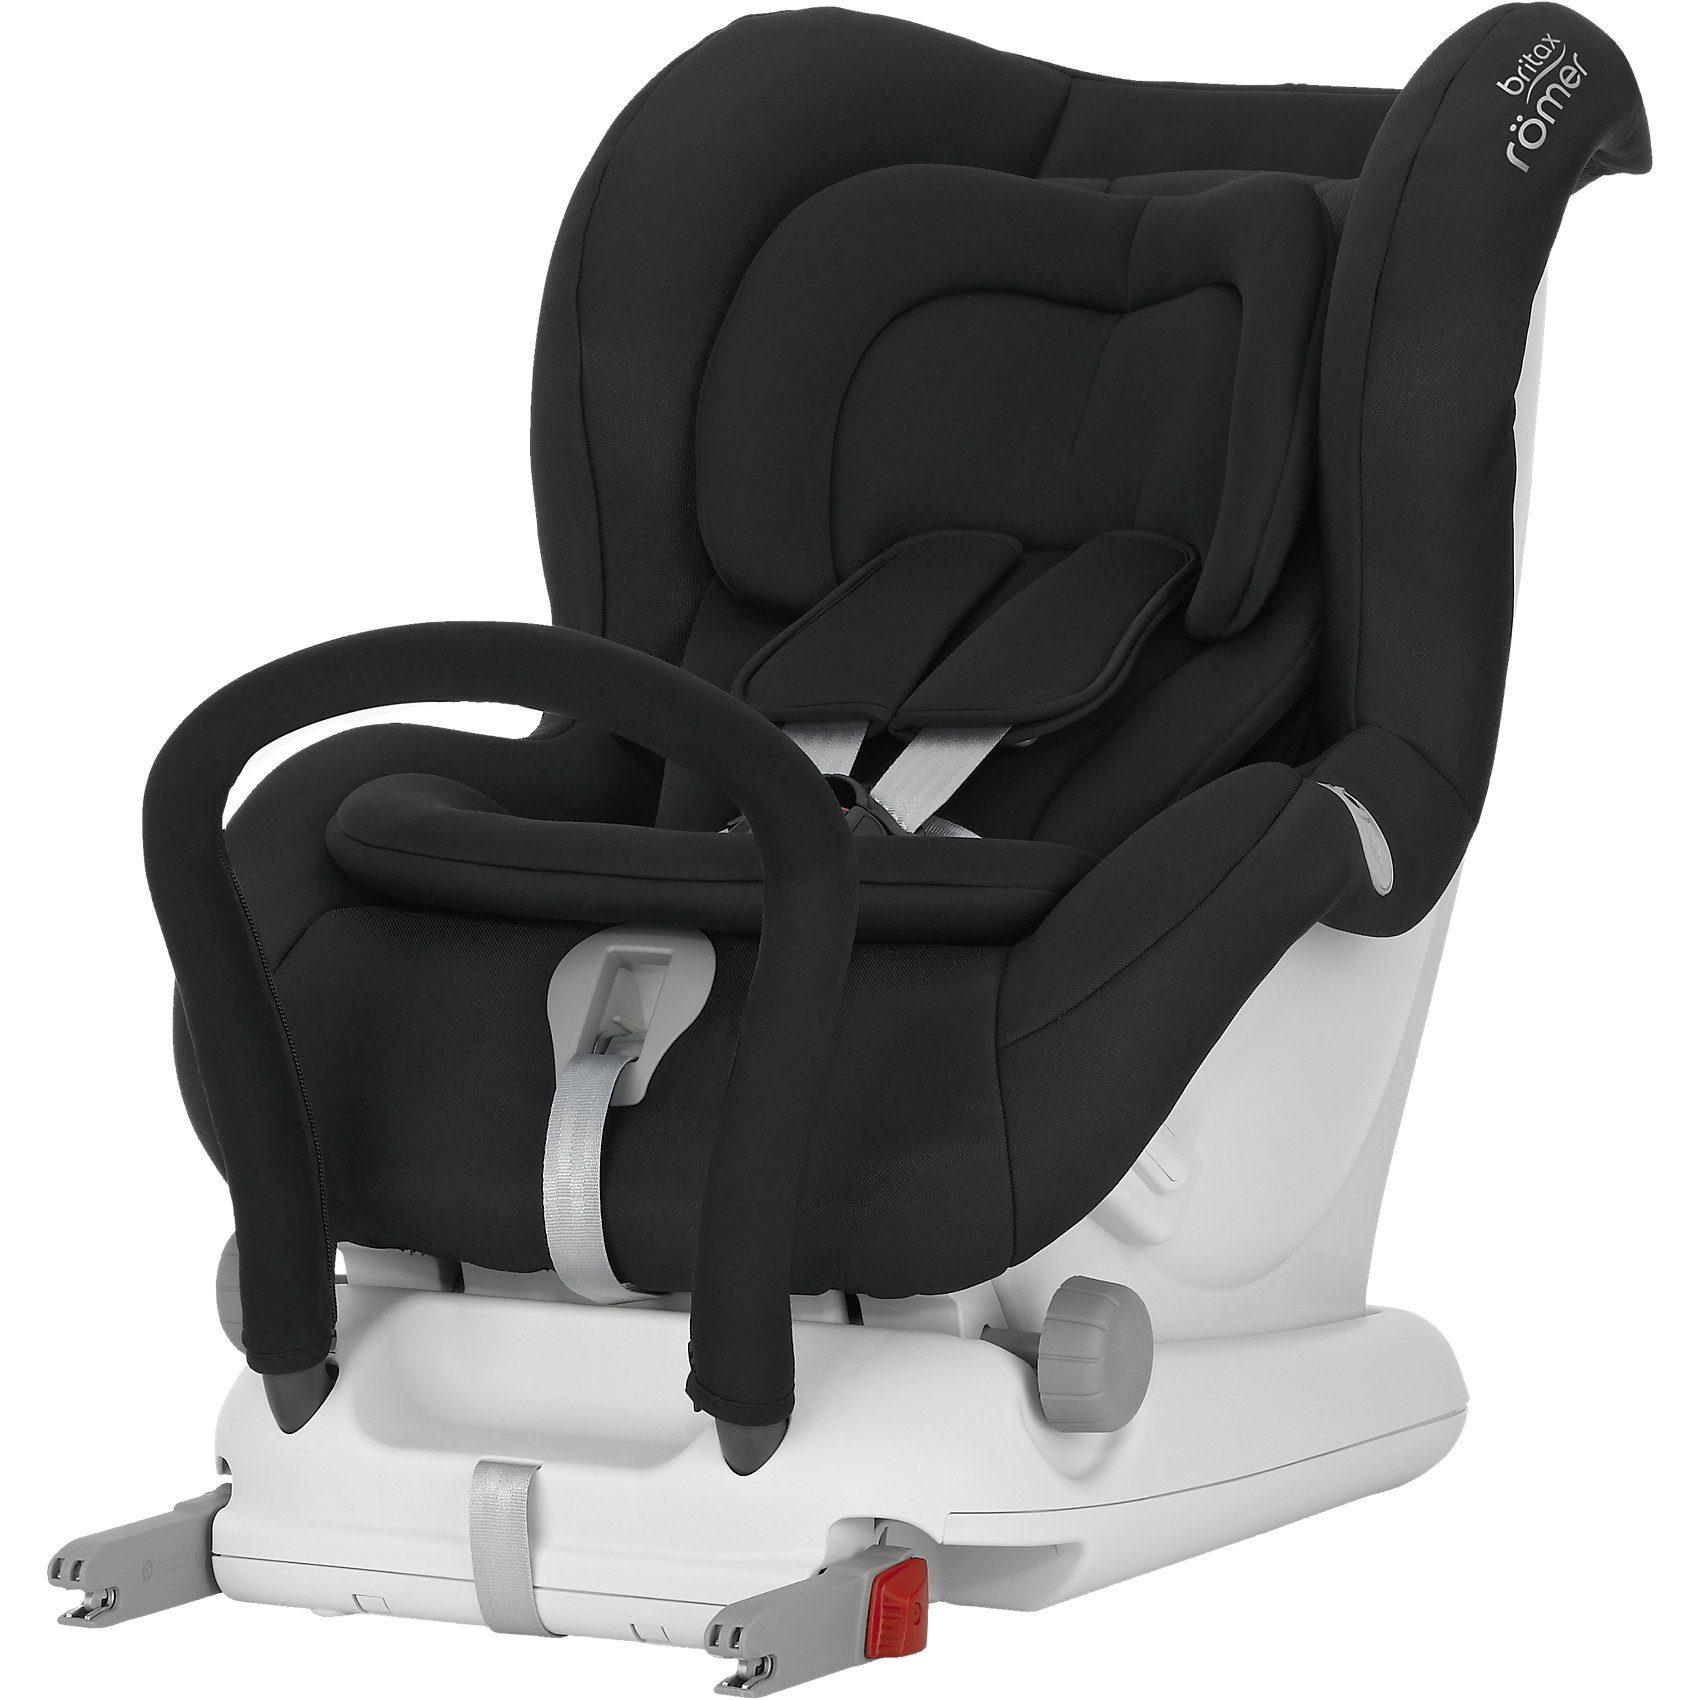 Britax Römer Auto-Kindersitz Max-Fix II, Cosmos Black, 2016